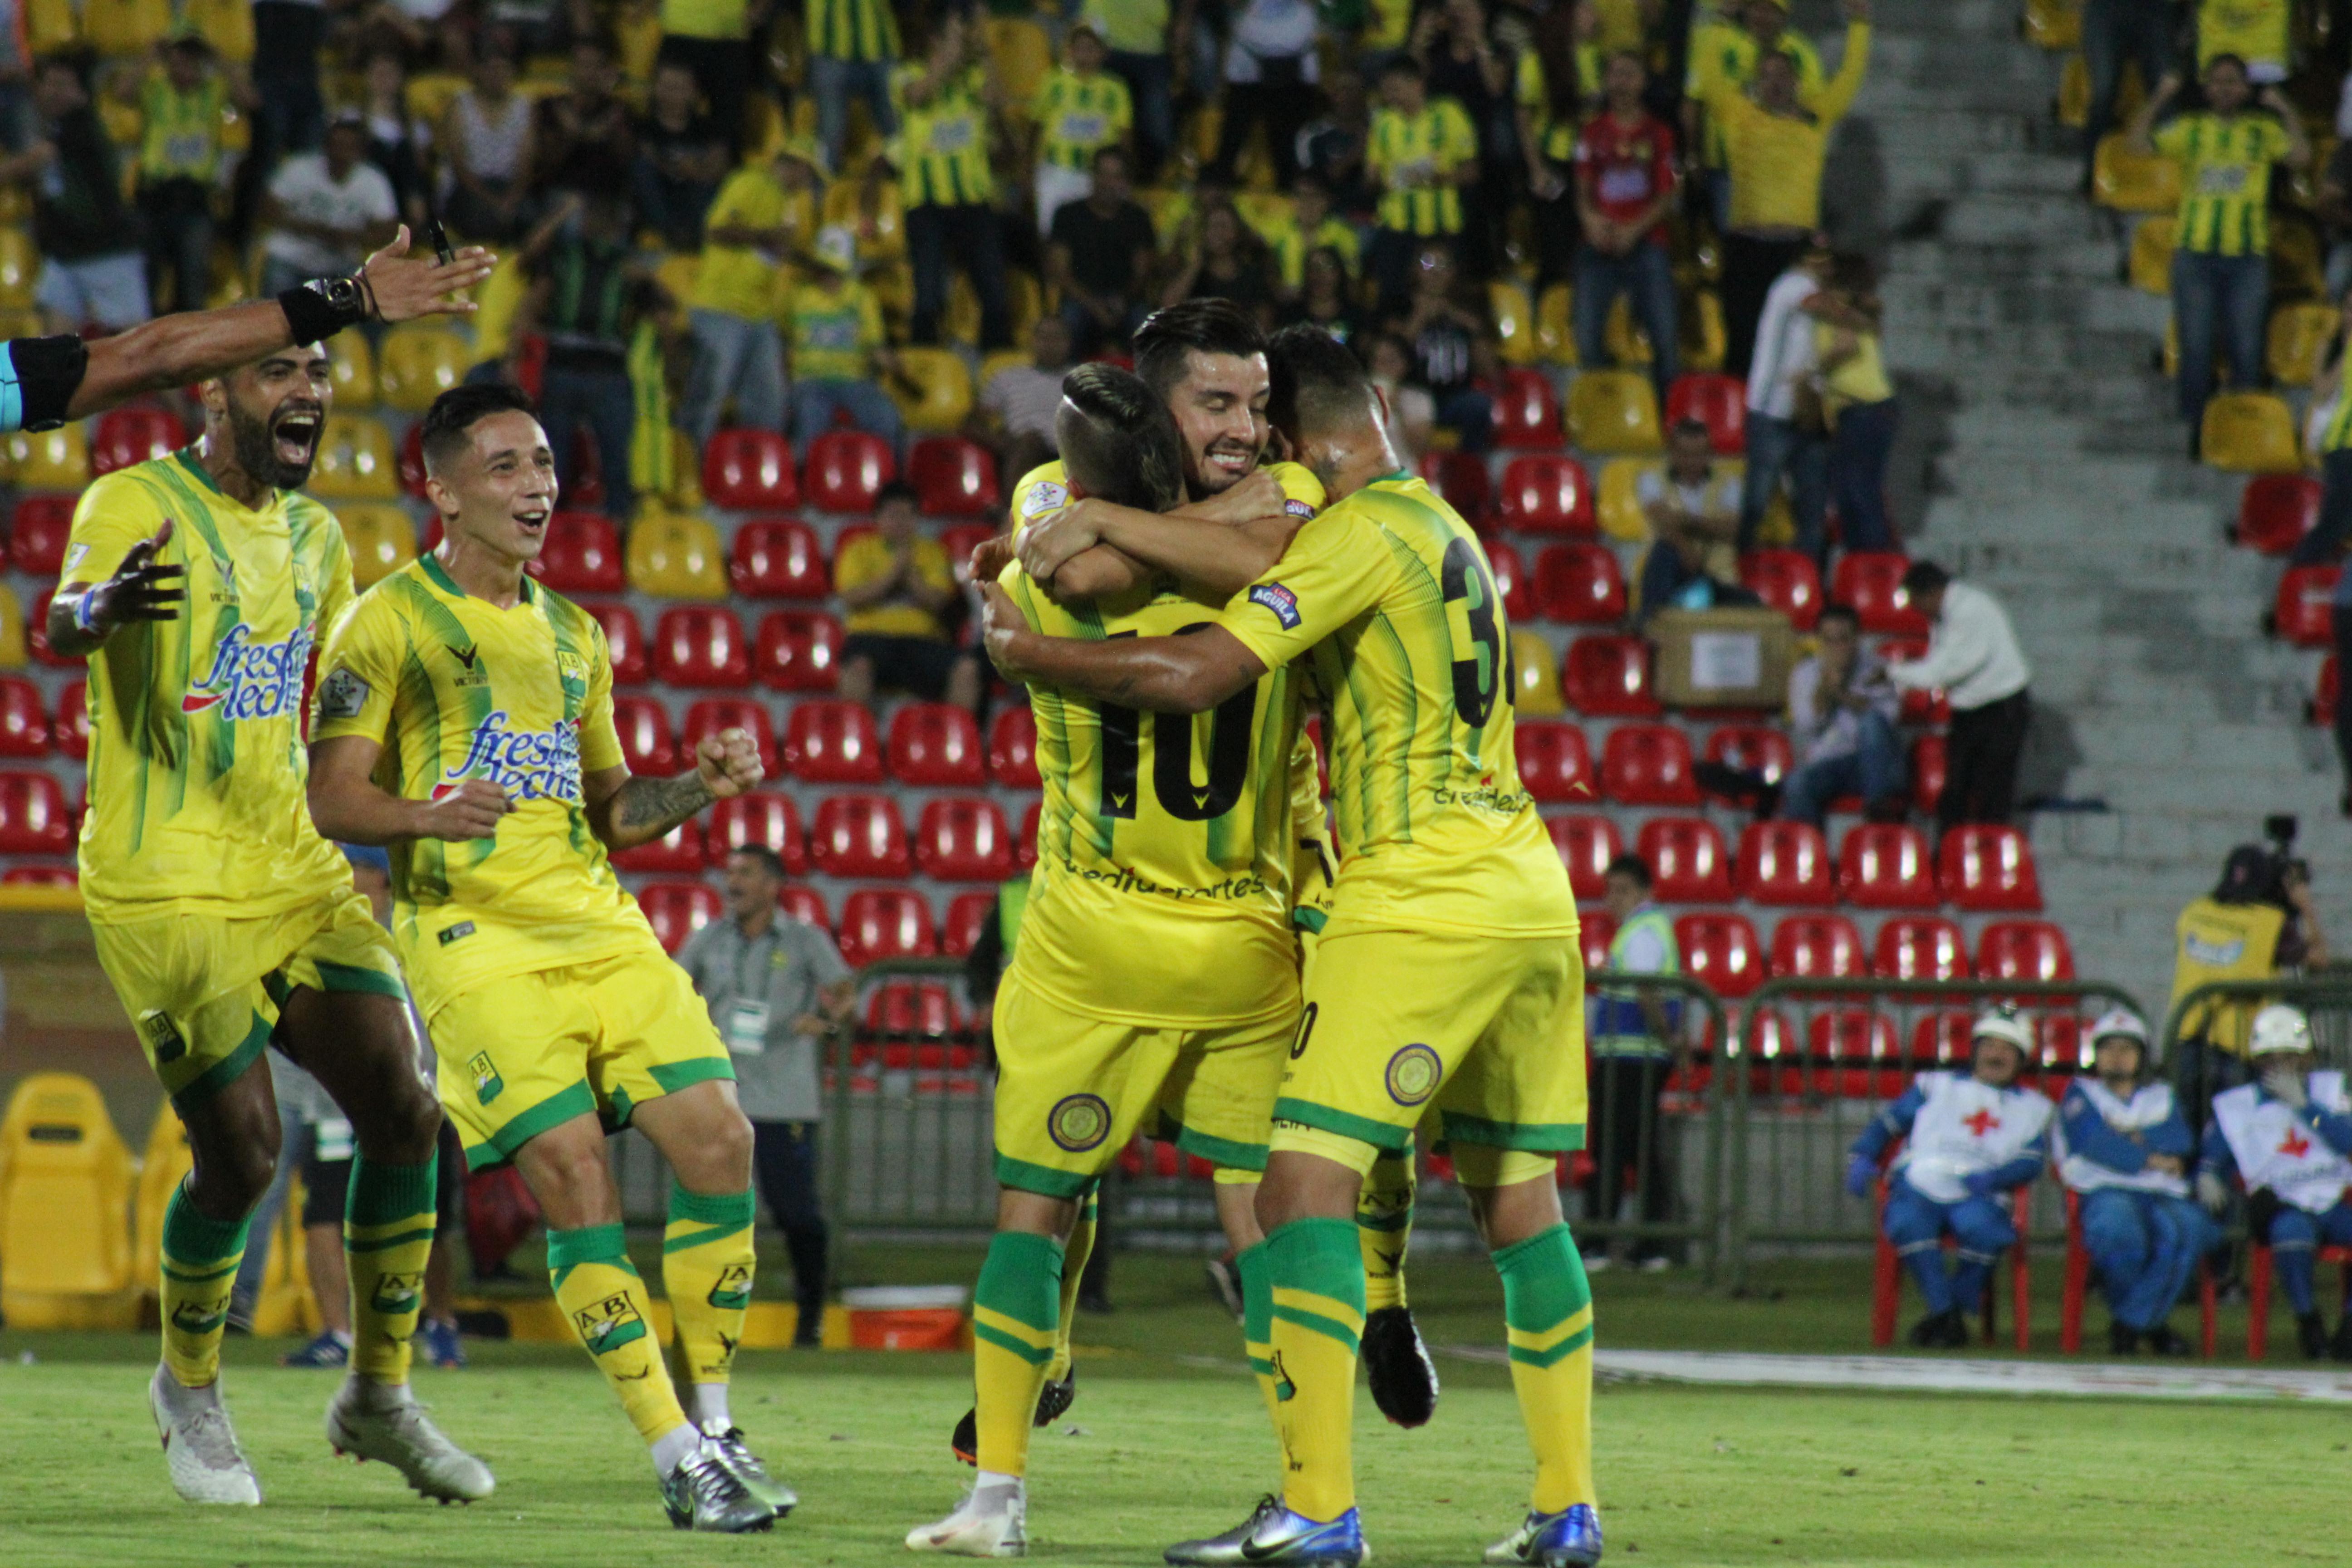 Atlético Bucaramanga va por su tercer triunfo en la Liga   EL FRENTE